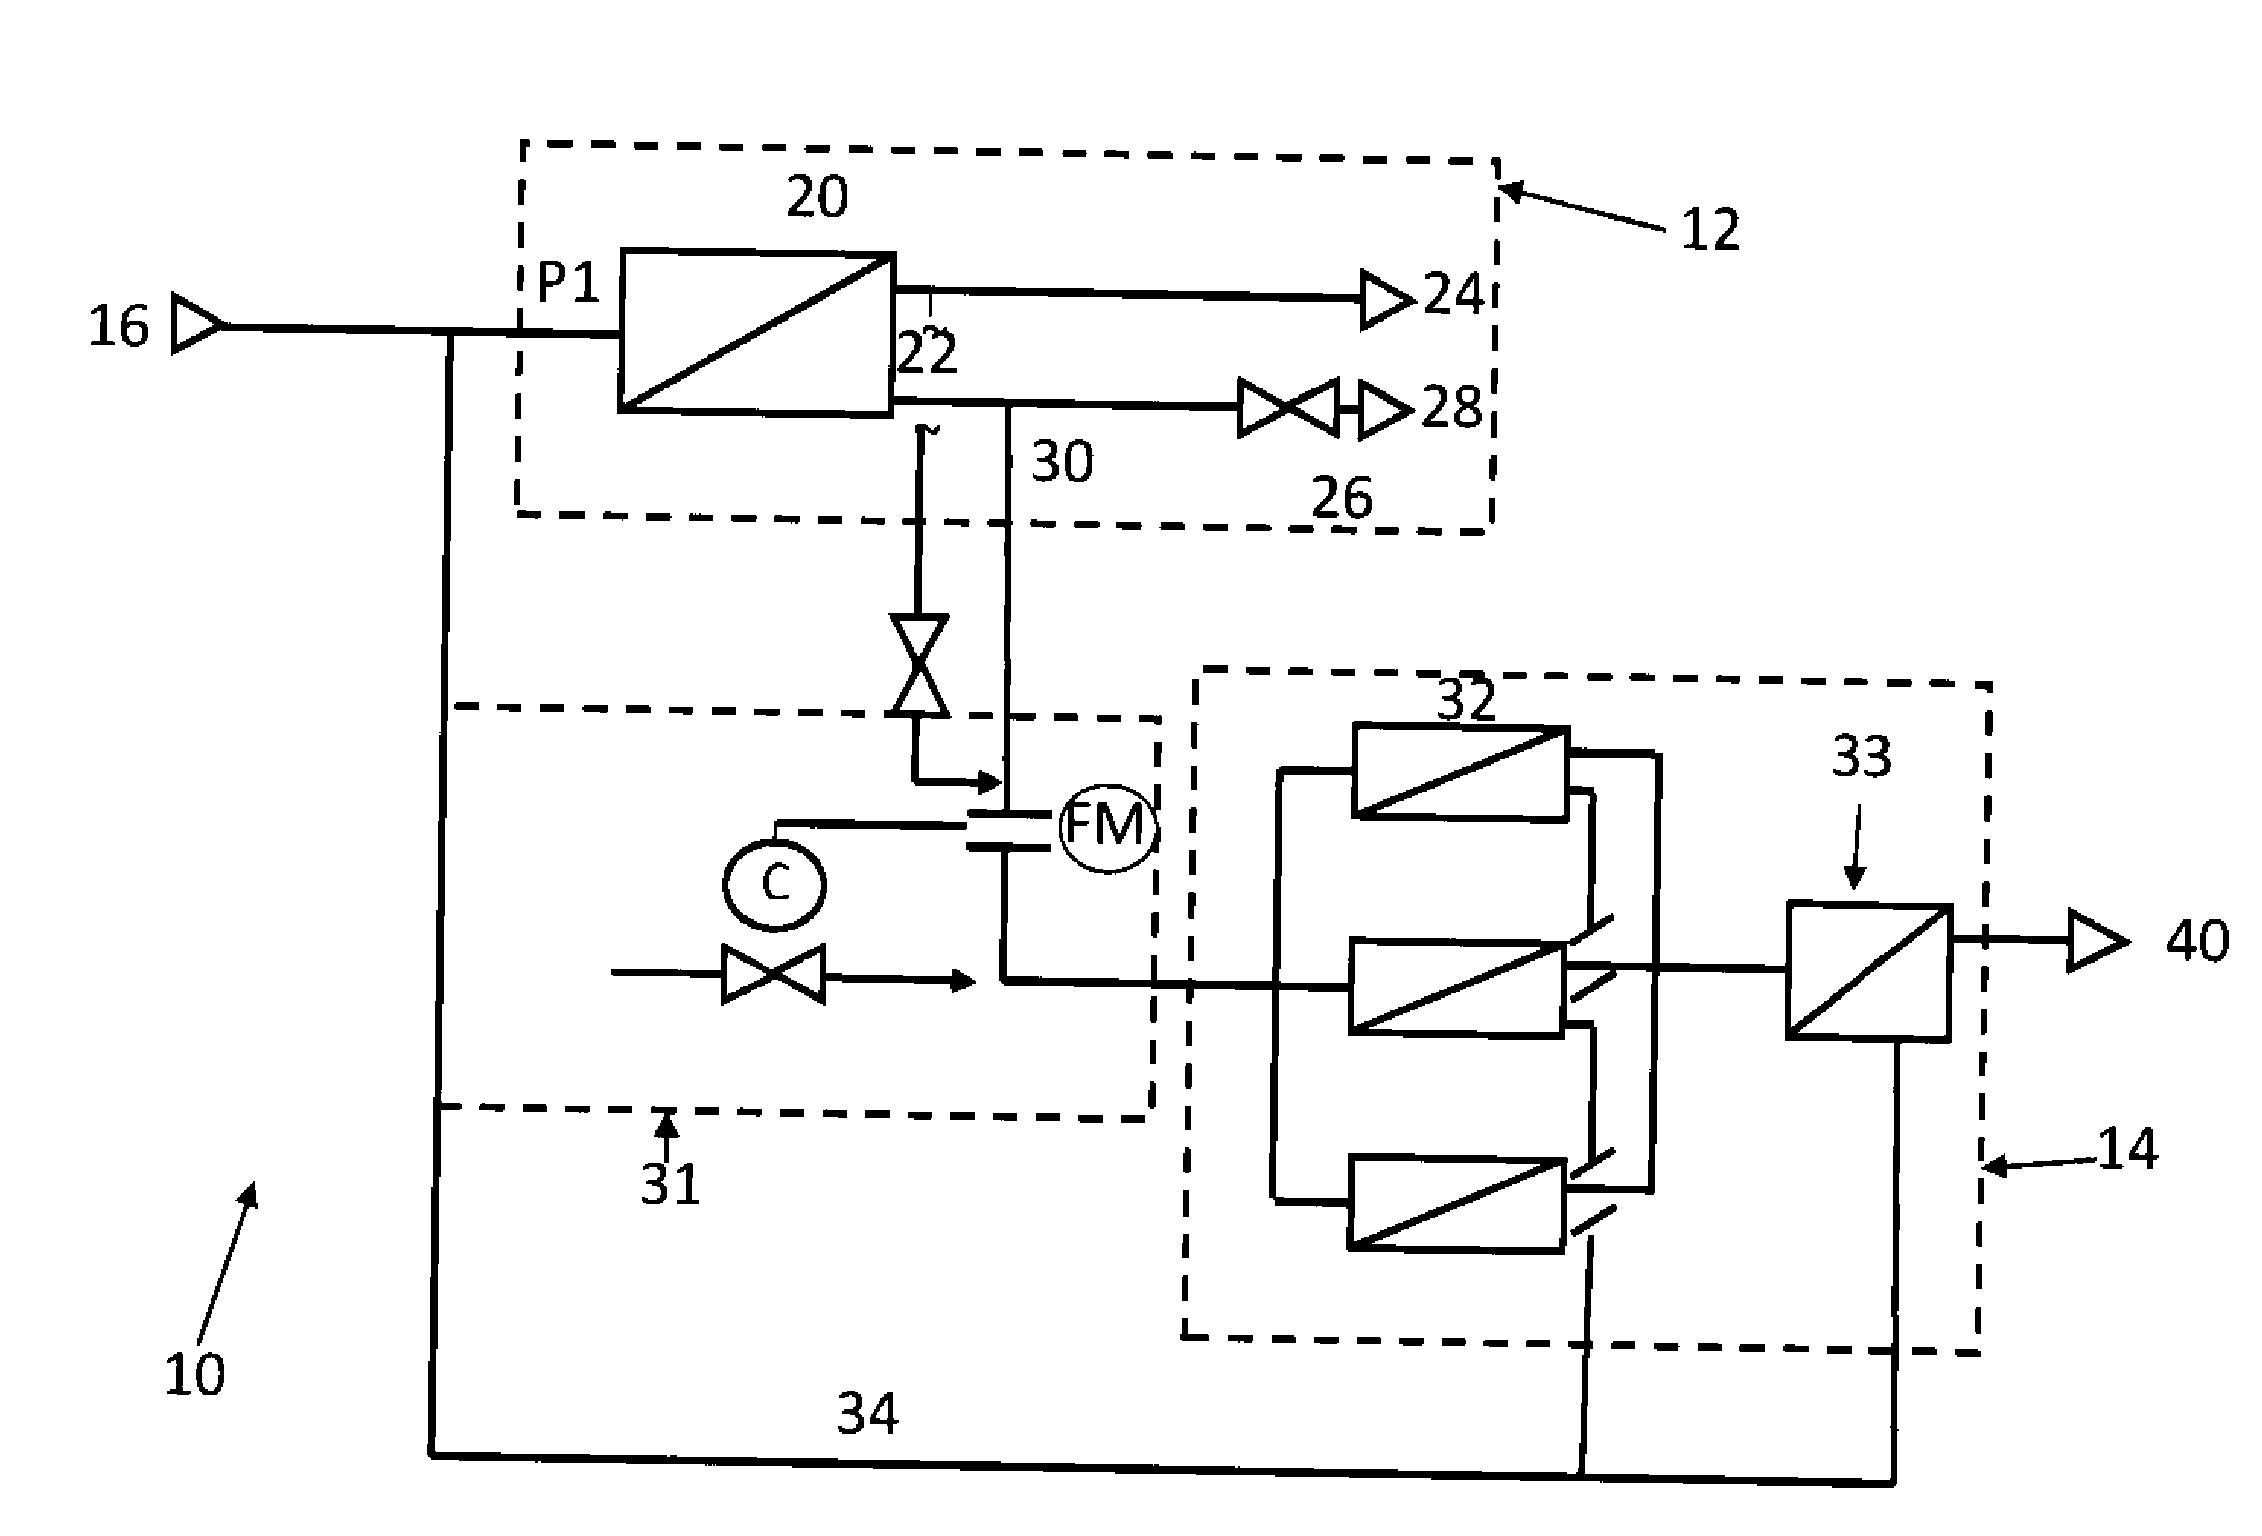 piping symbols engineering diagram